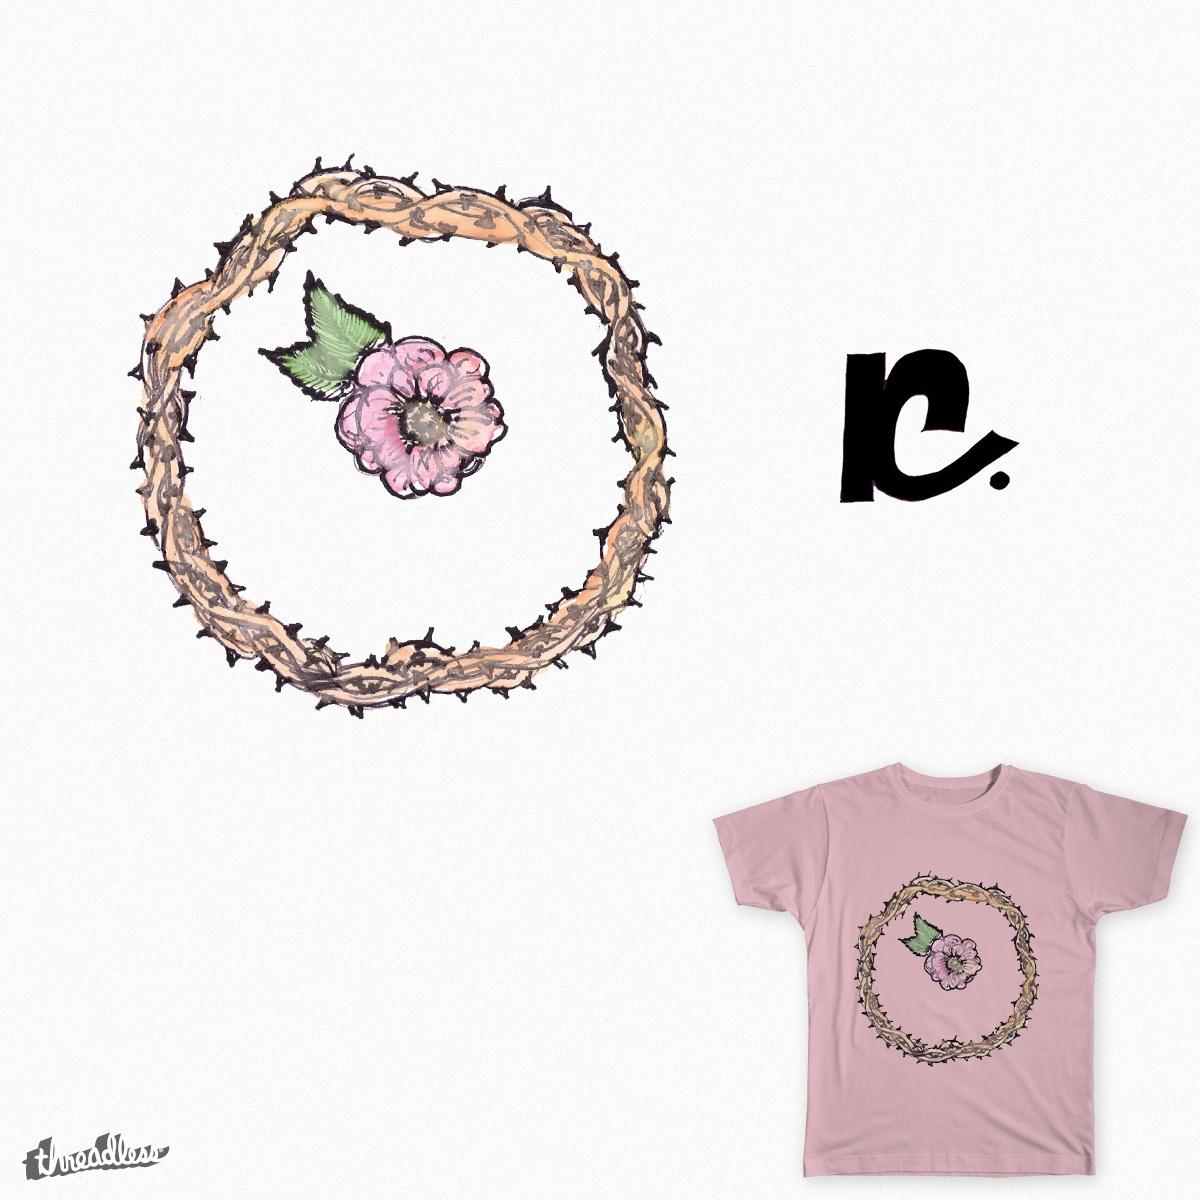 Rose of Sharon by Kettleheadmex on Threadless